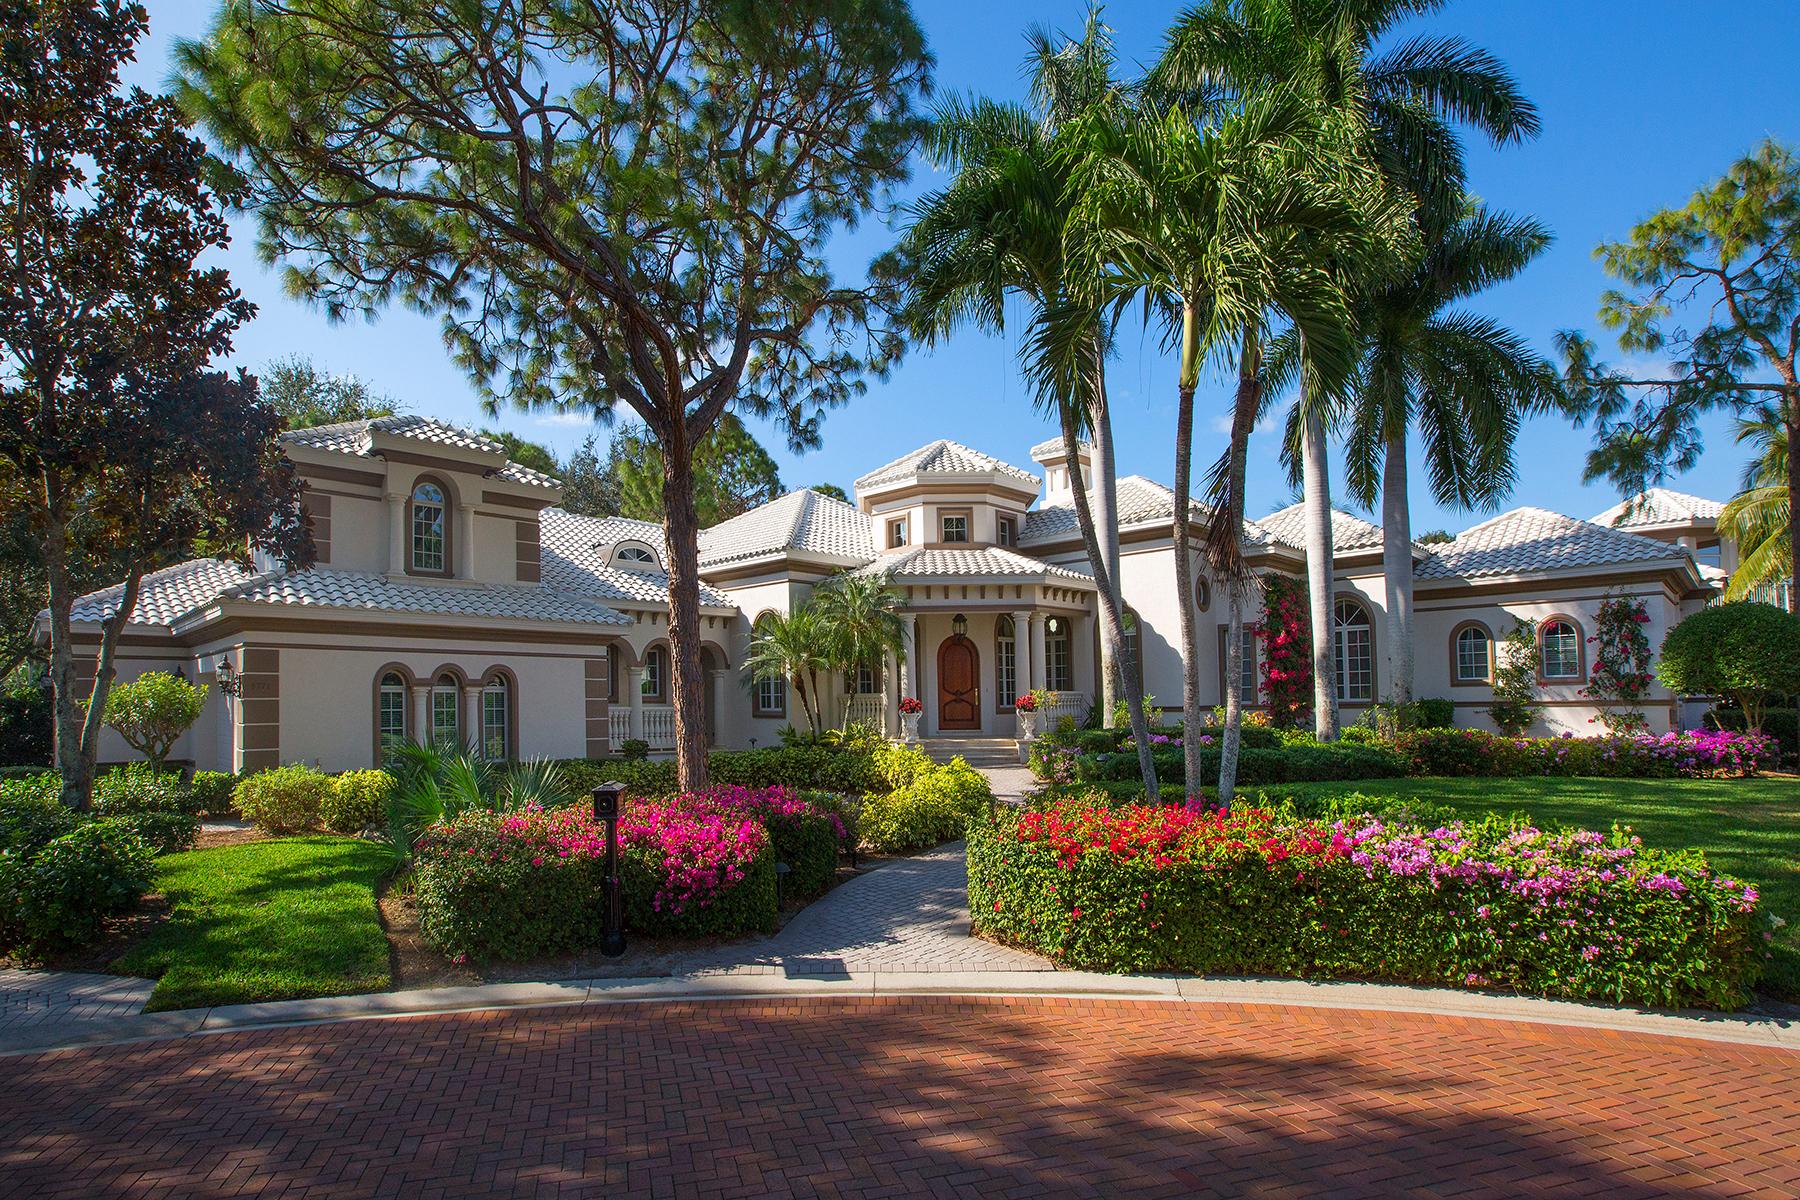 Villa per Vendita alle ore 9771 Niblick Ln , Naples, FL 34108 9771 Niblick Ln Naples, Florida, 34108 Stati Uniti